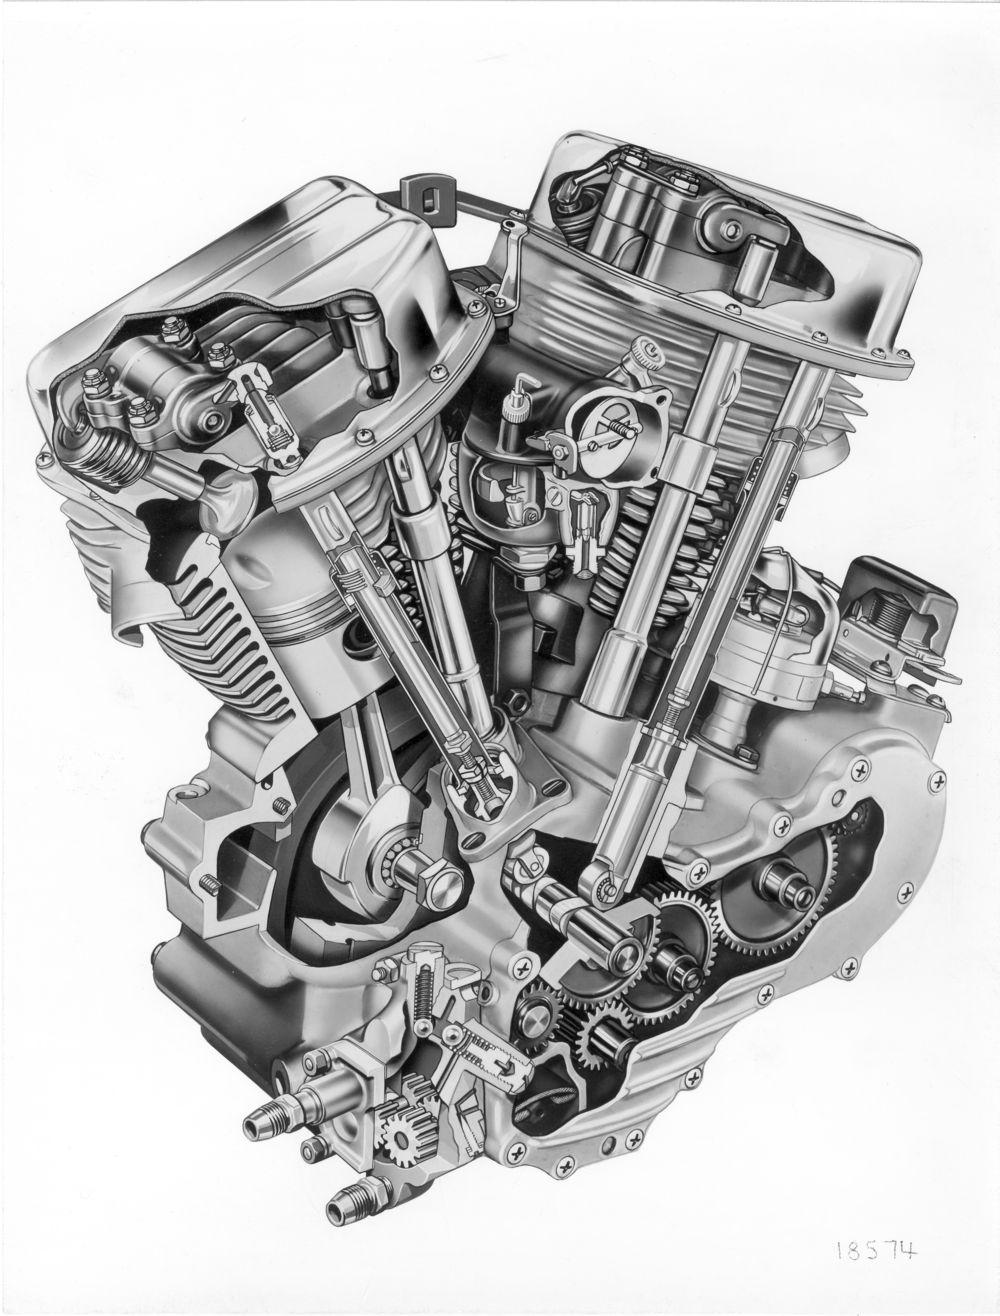 Vista interior de un motor OHV Panhead